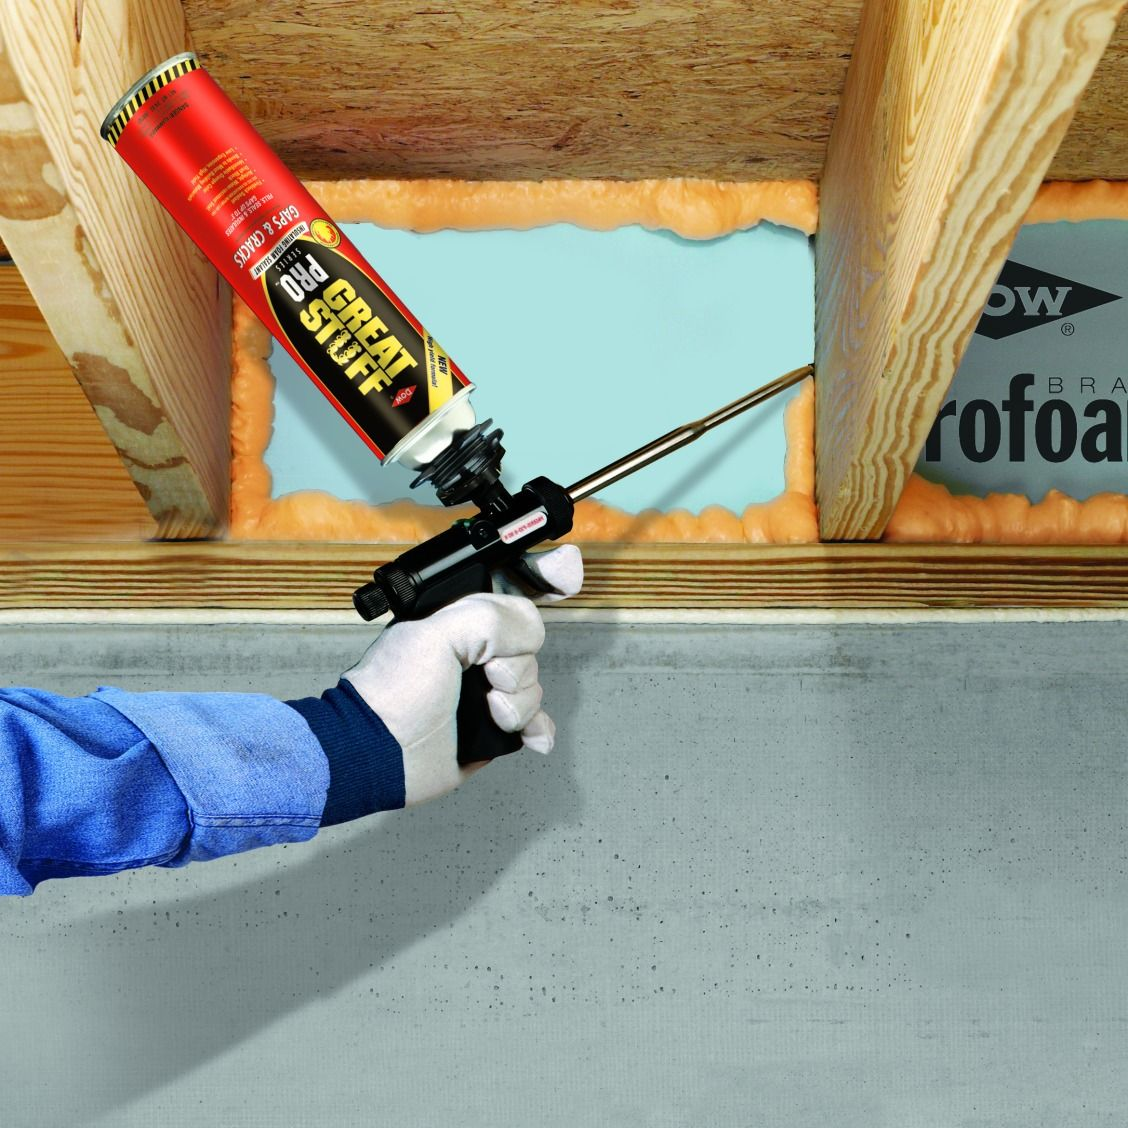 GREAT STUFF™ Big Gap Filler Insulating Foam Sealant offers